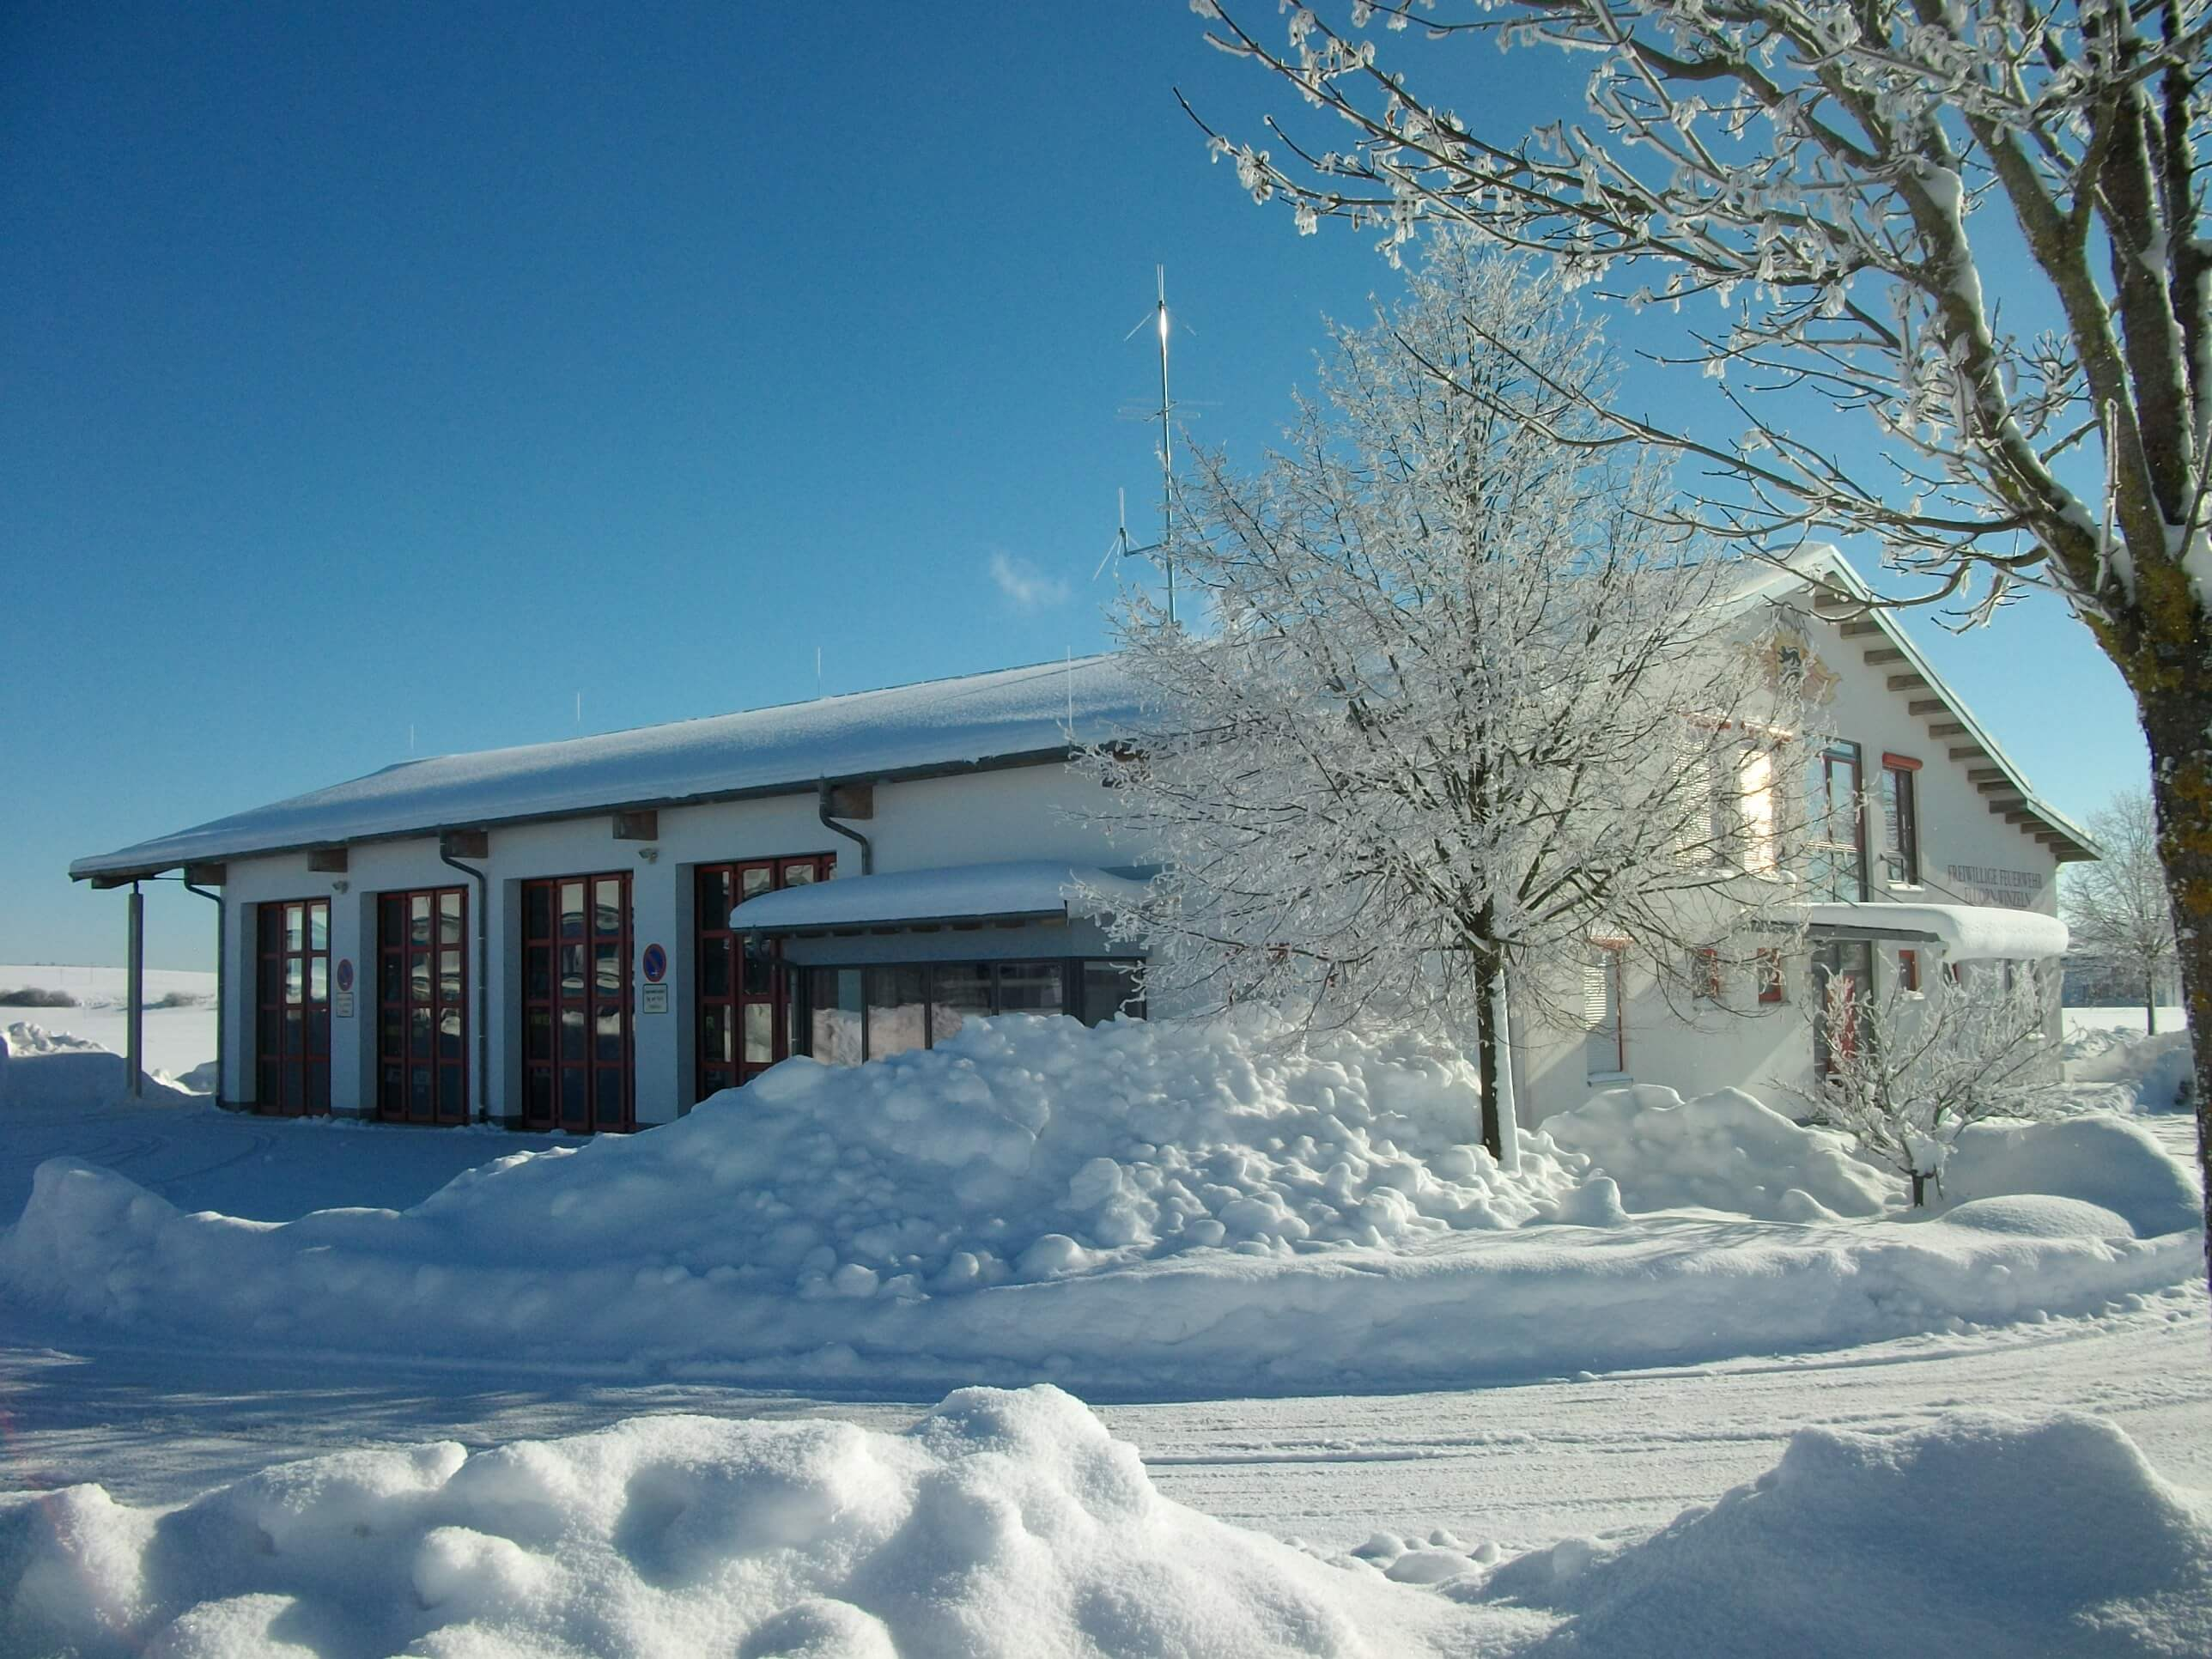 Feuerwehrhaus im Winter